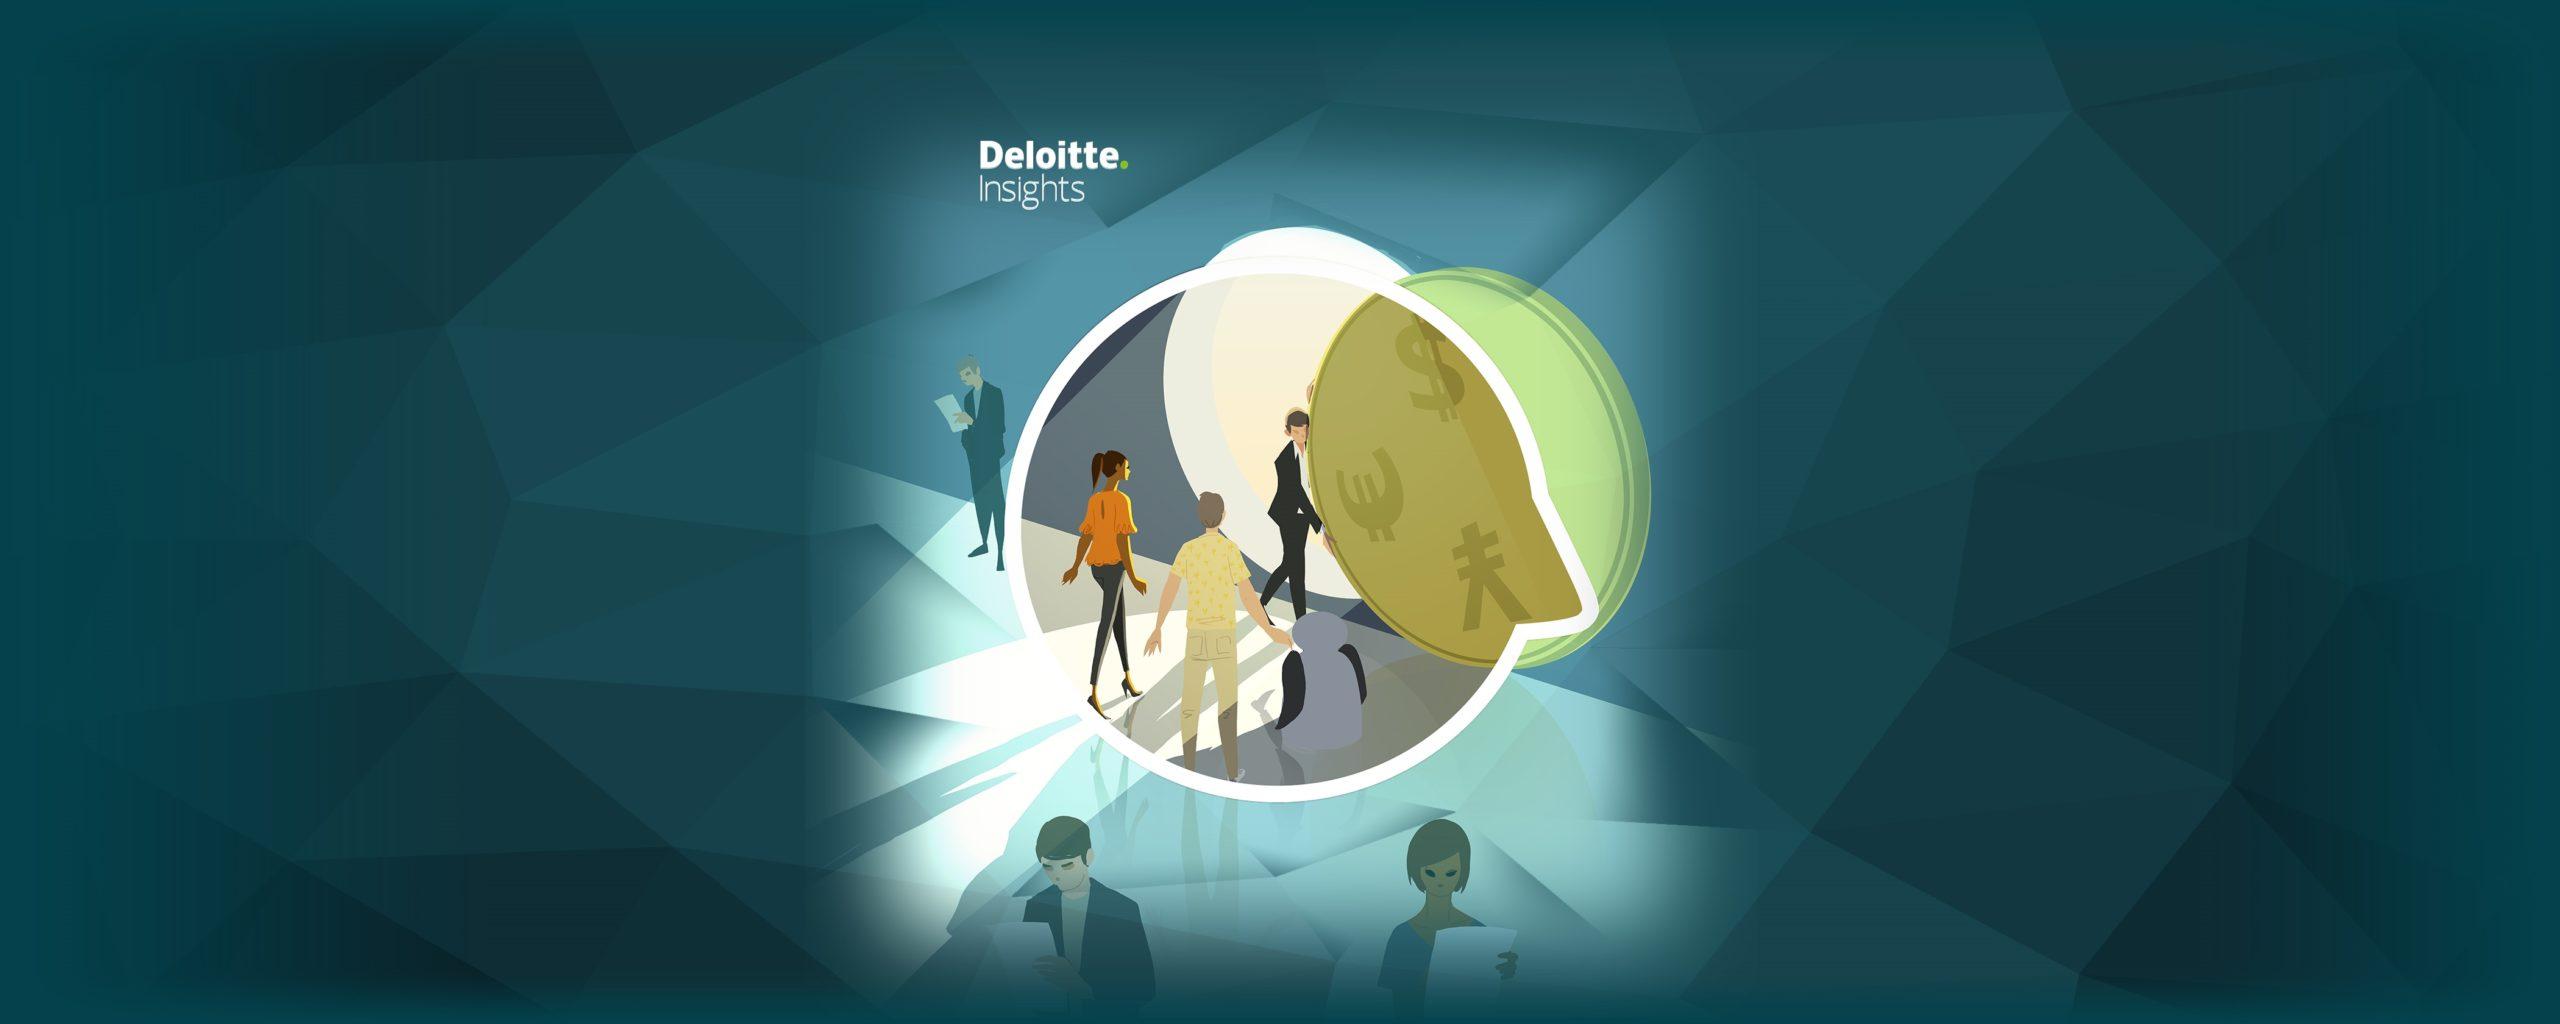 Matthieu Forichon illustration for Deloitte